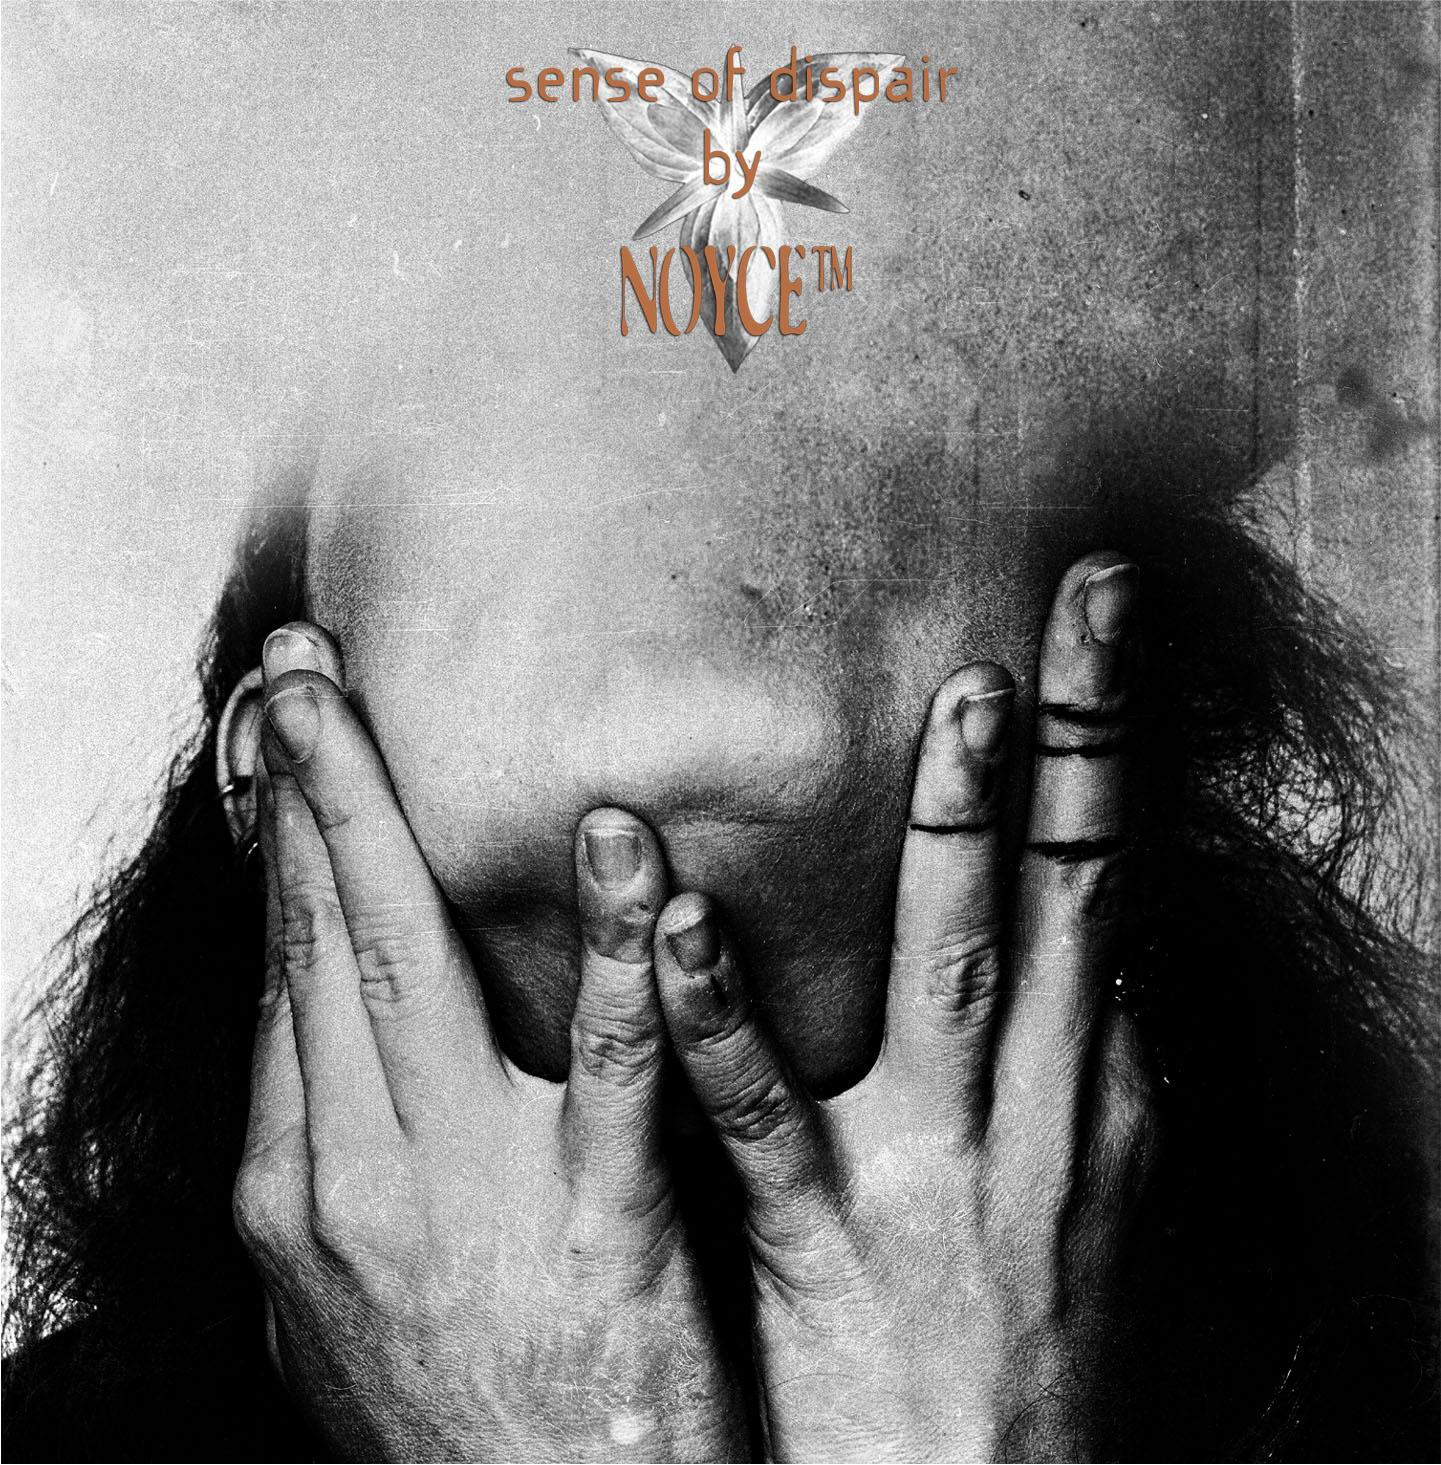 Noyce™ - Sense of Despair - Noyce™ - Sense of Despair